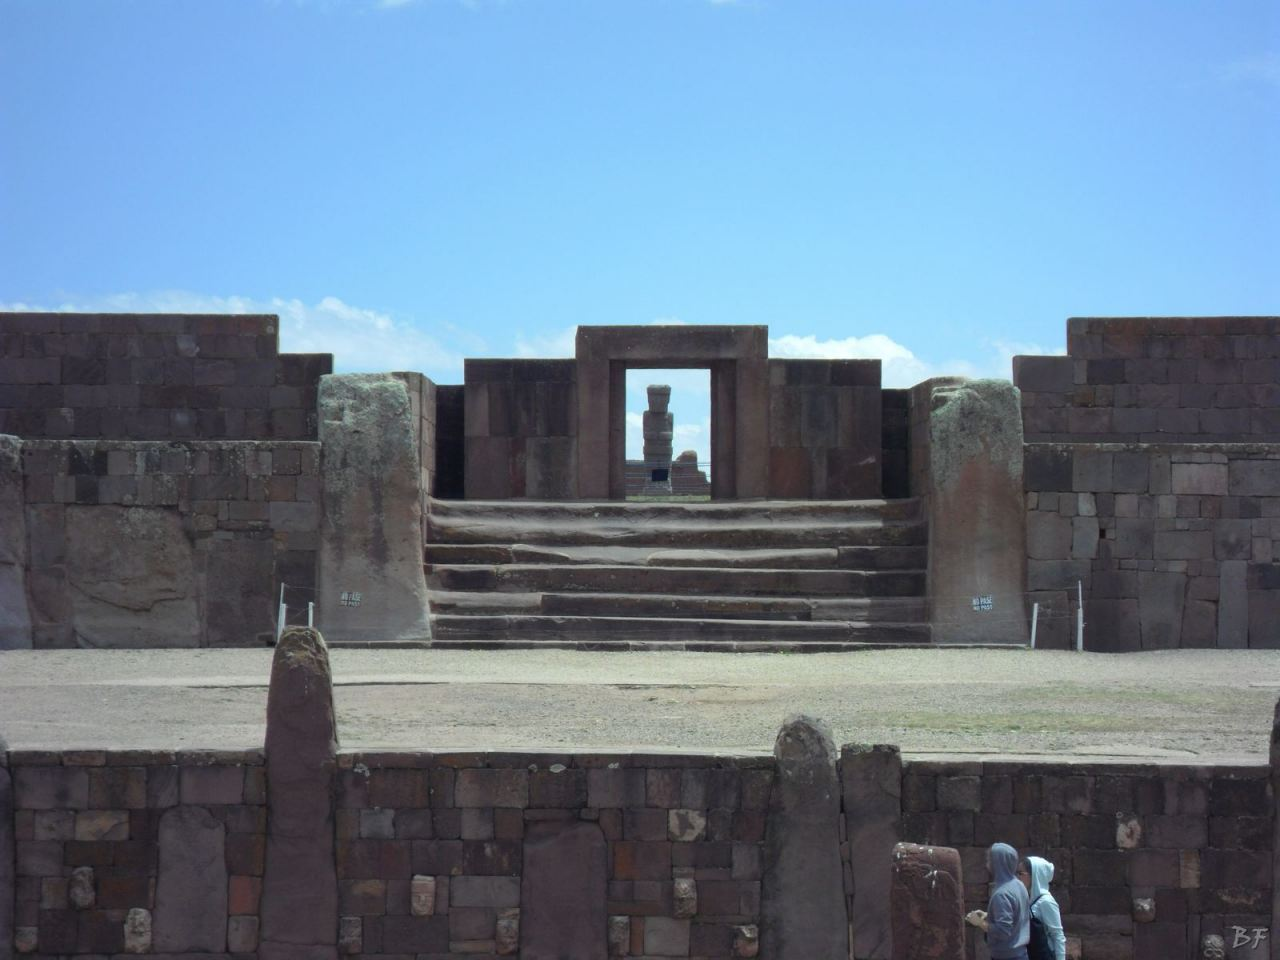 Sito-Megalitico-Piramide-Akapana-Kalasasaya-Menhir-Tiahuanaco-Bolivia-98